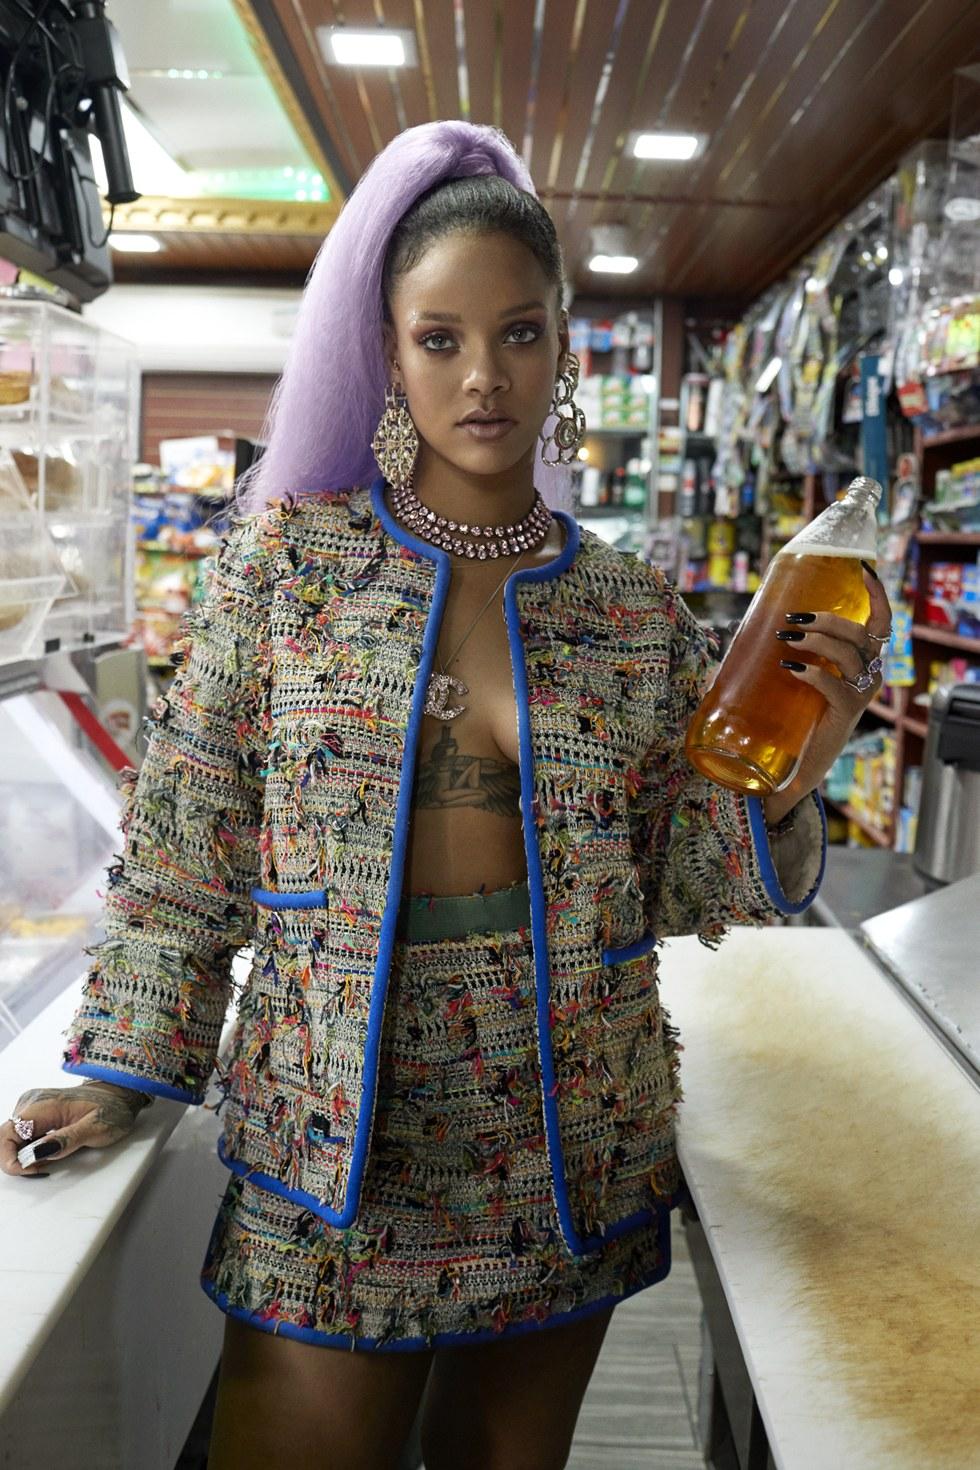 Rihanna By Sebastian Faena For Paper March 2017